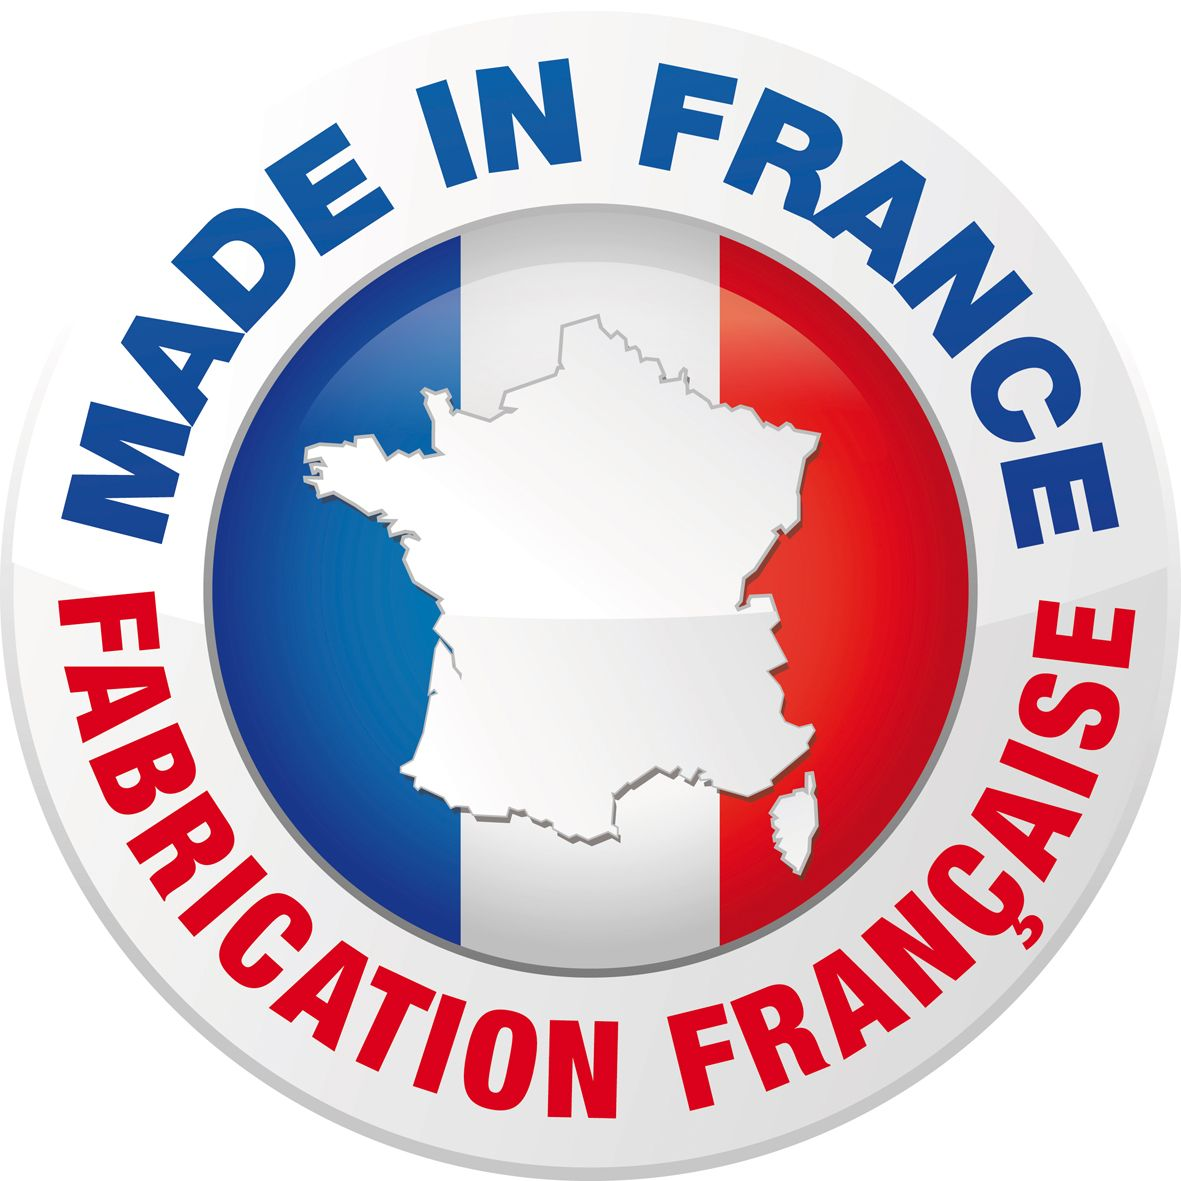 Pourquoi le Made by France serait plus utile que le Made in France